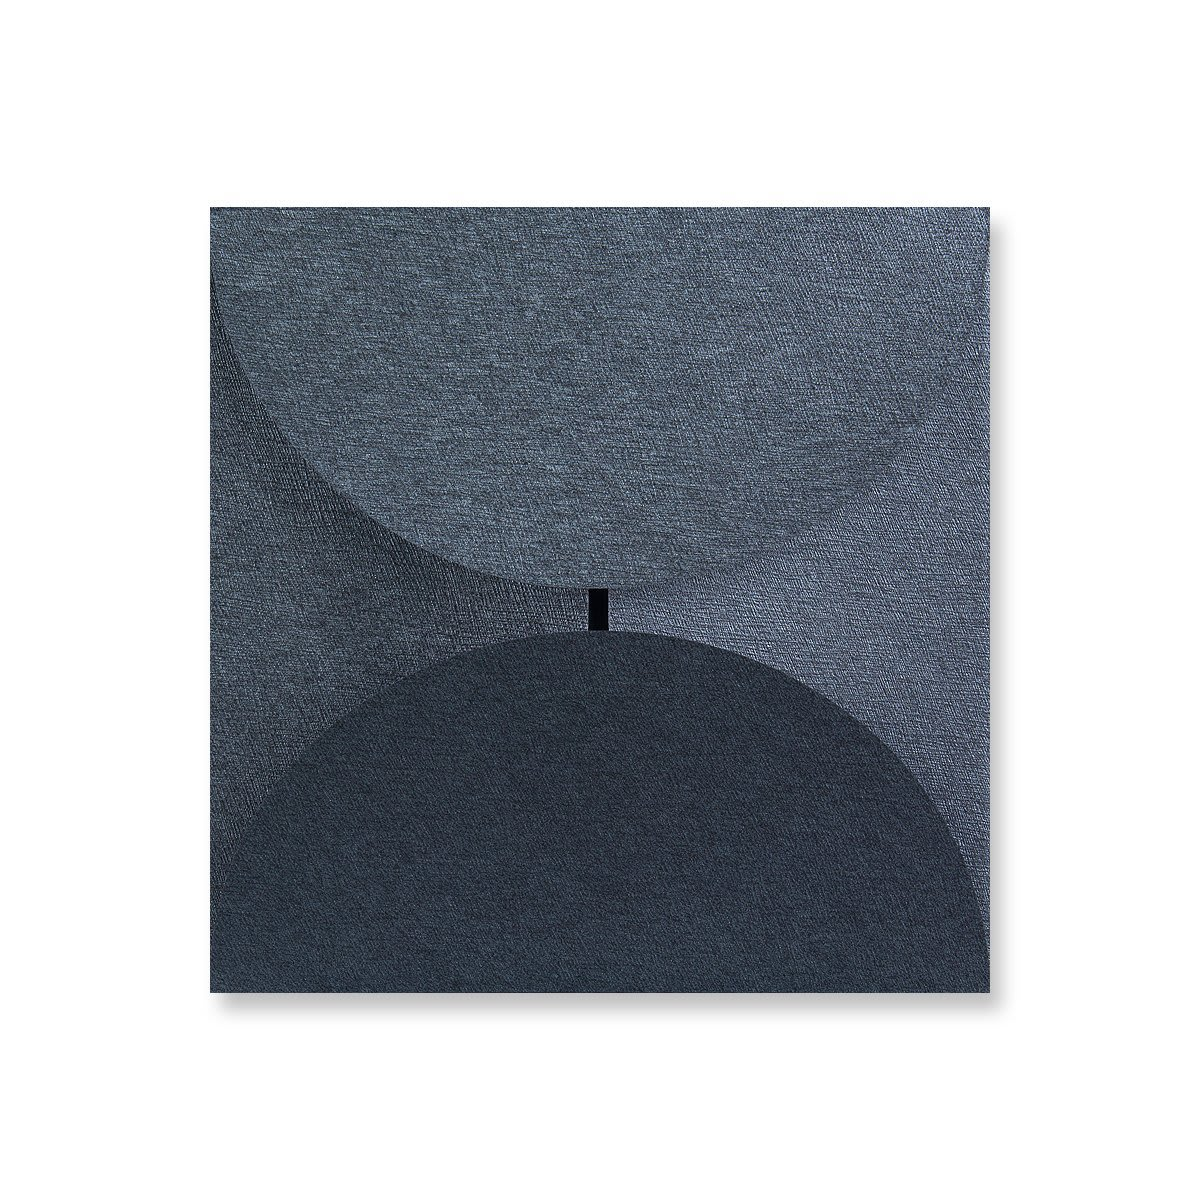 145 x 145mm MID GREY POUCHETTES